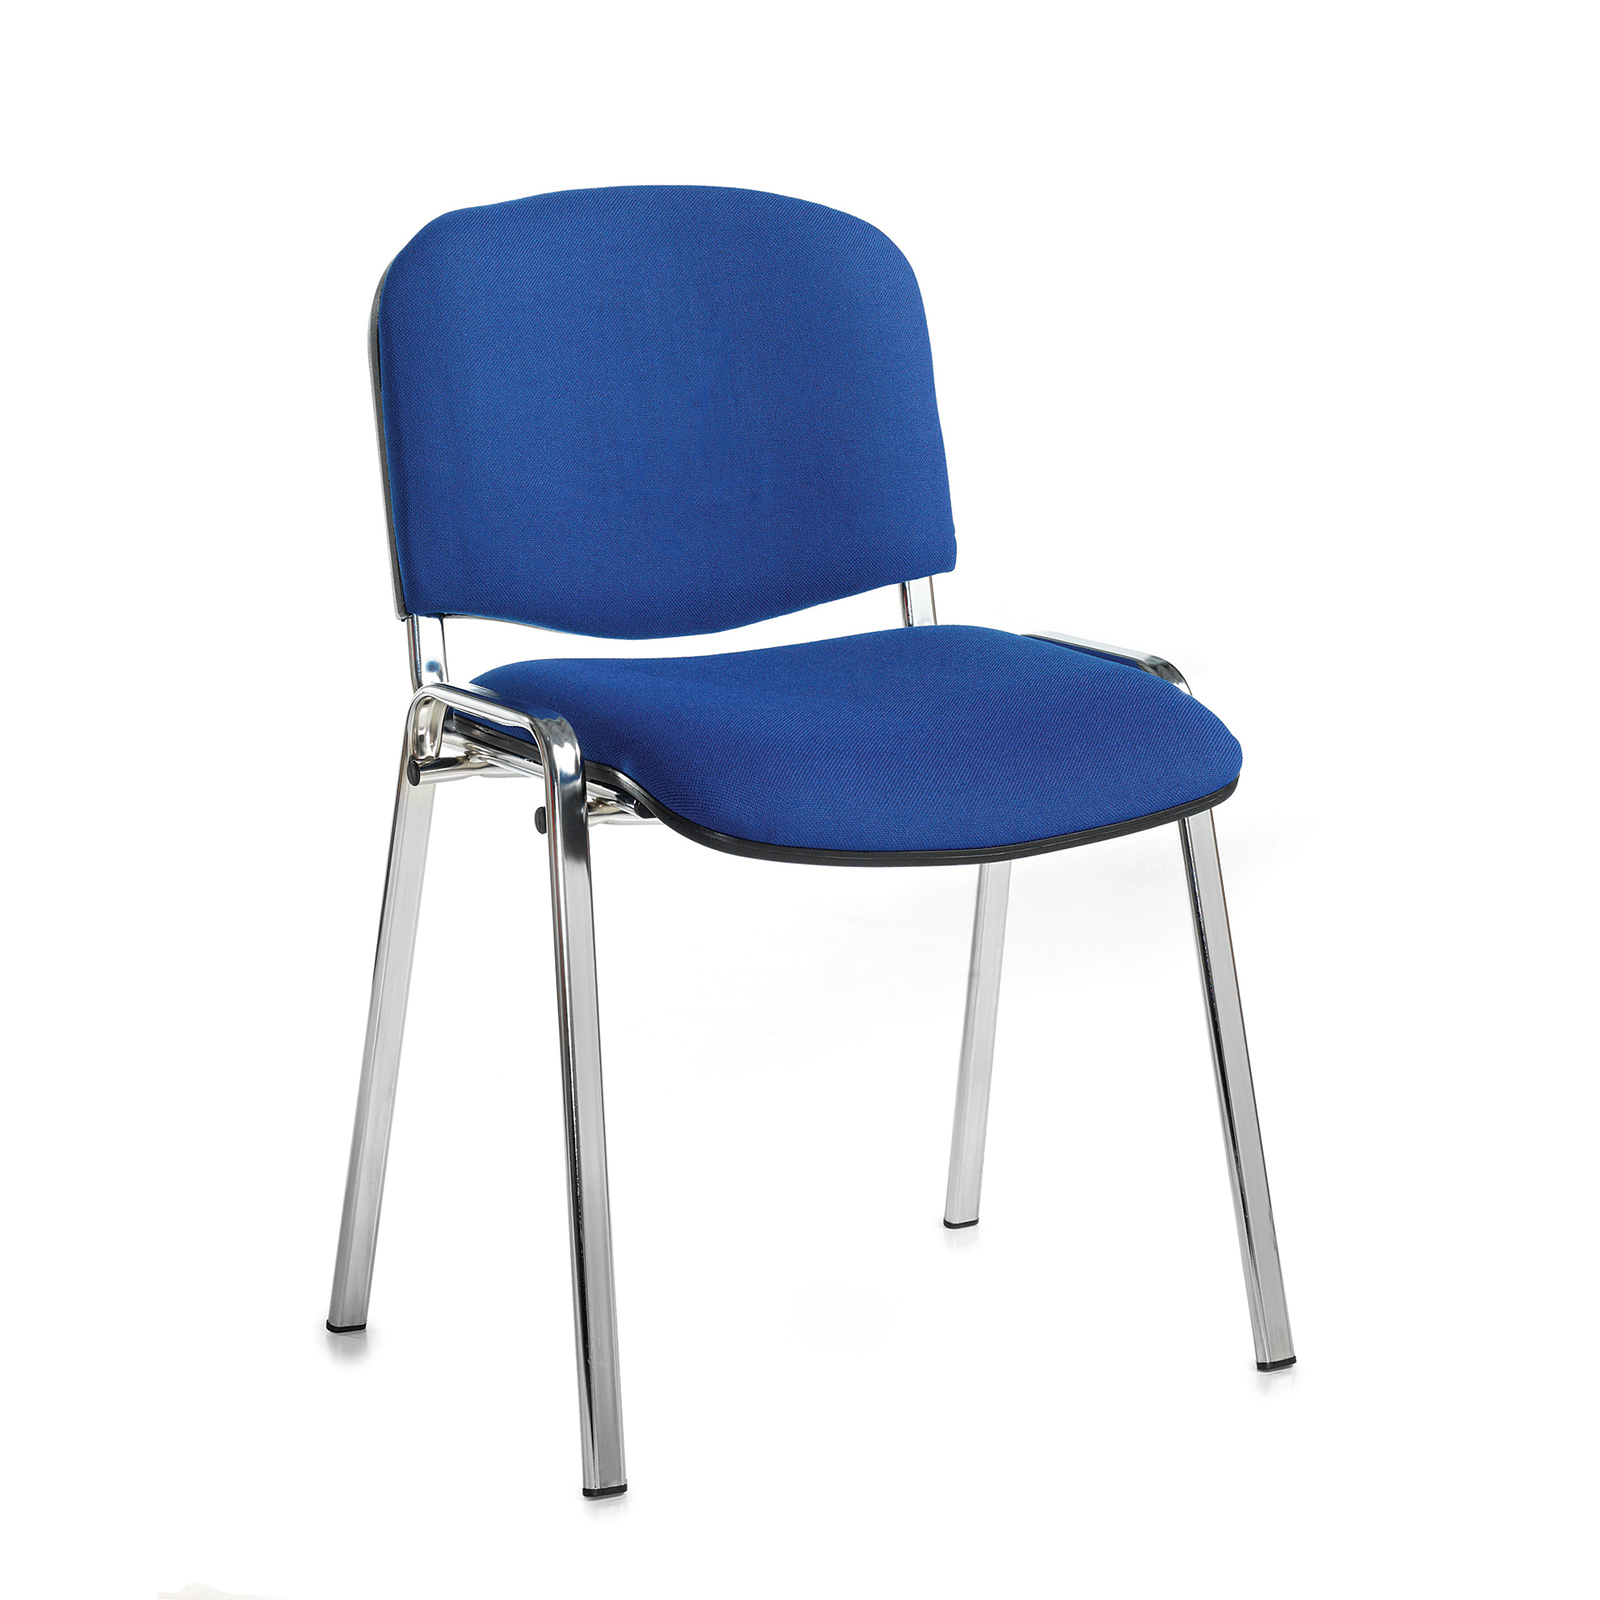 Desks Taurus meeting room chair with chrome frame